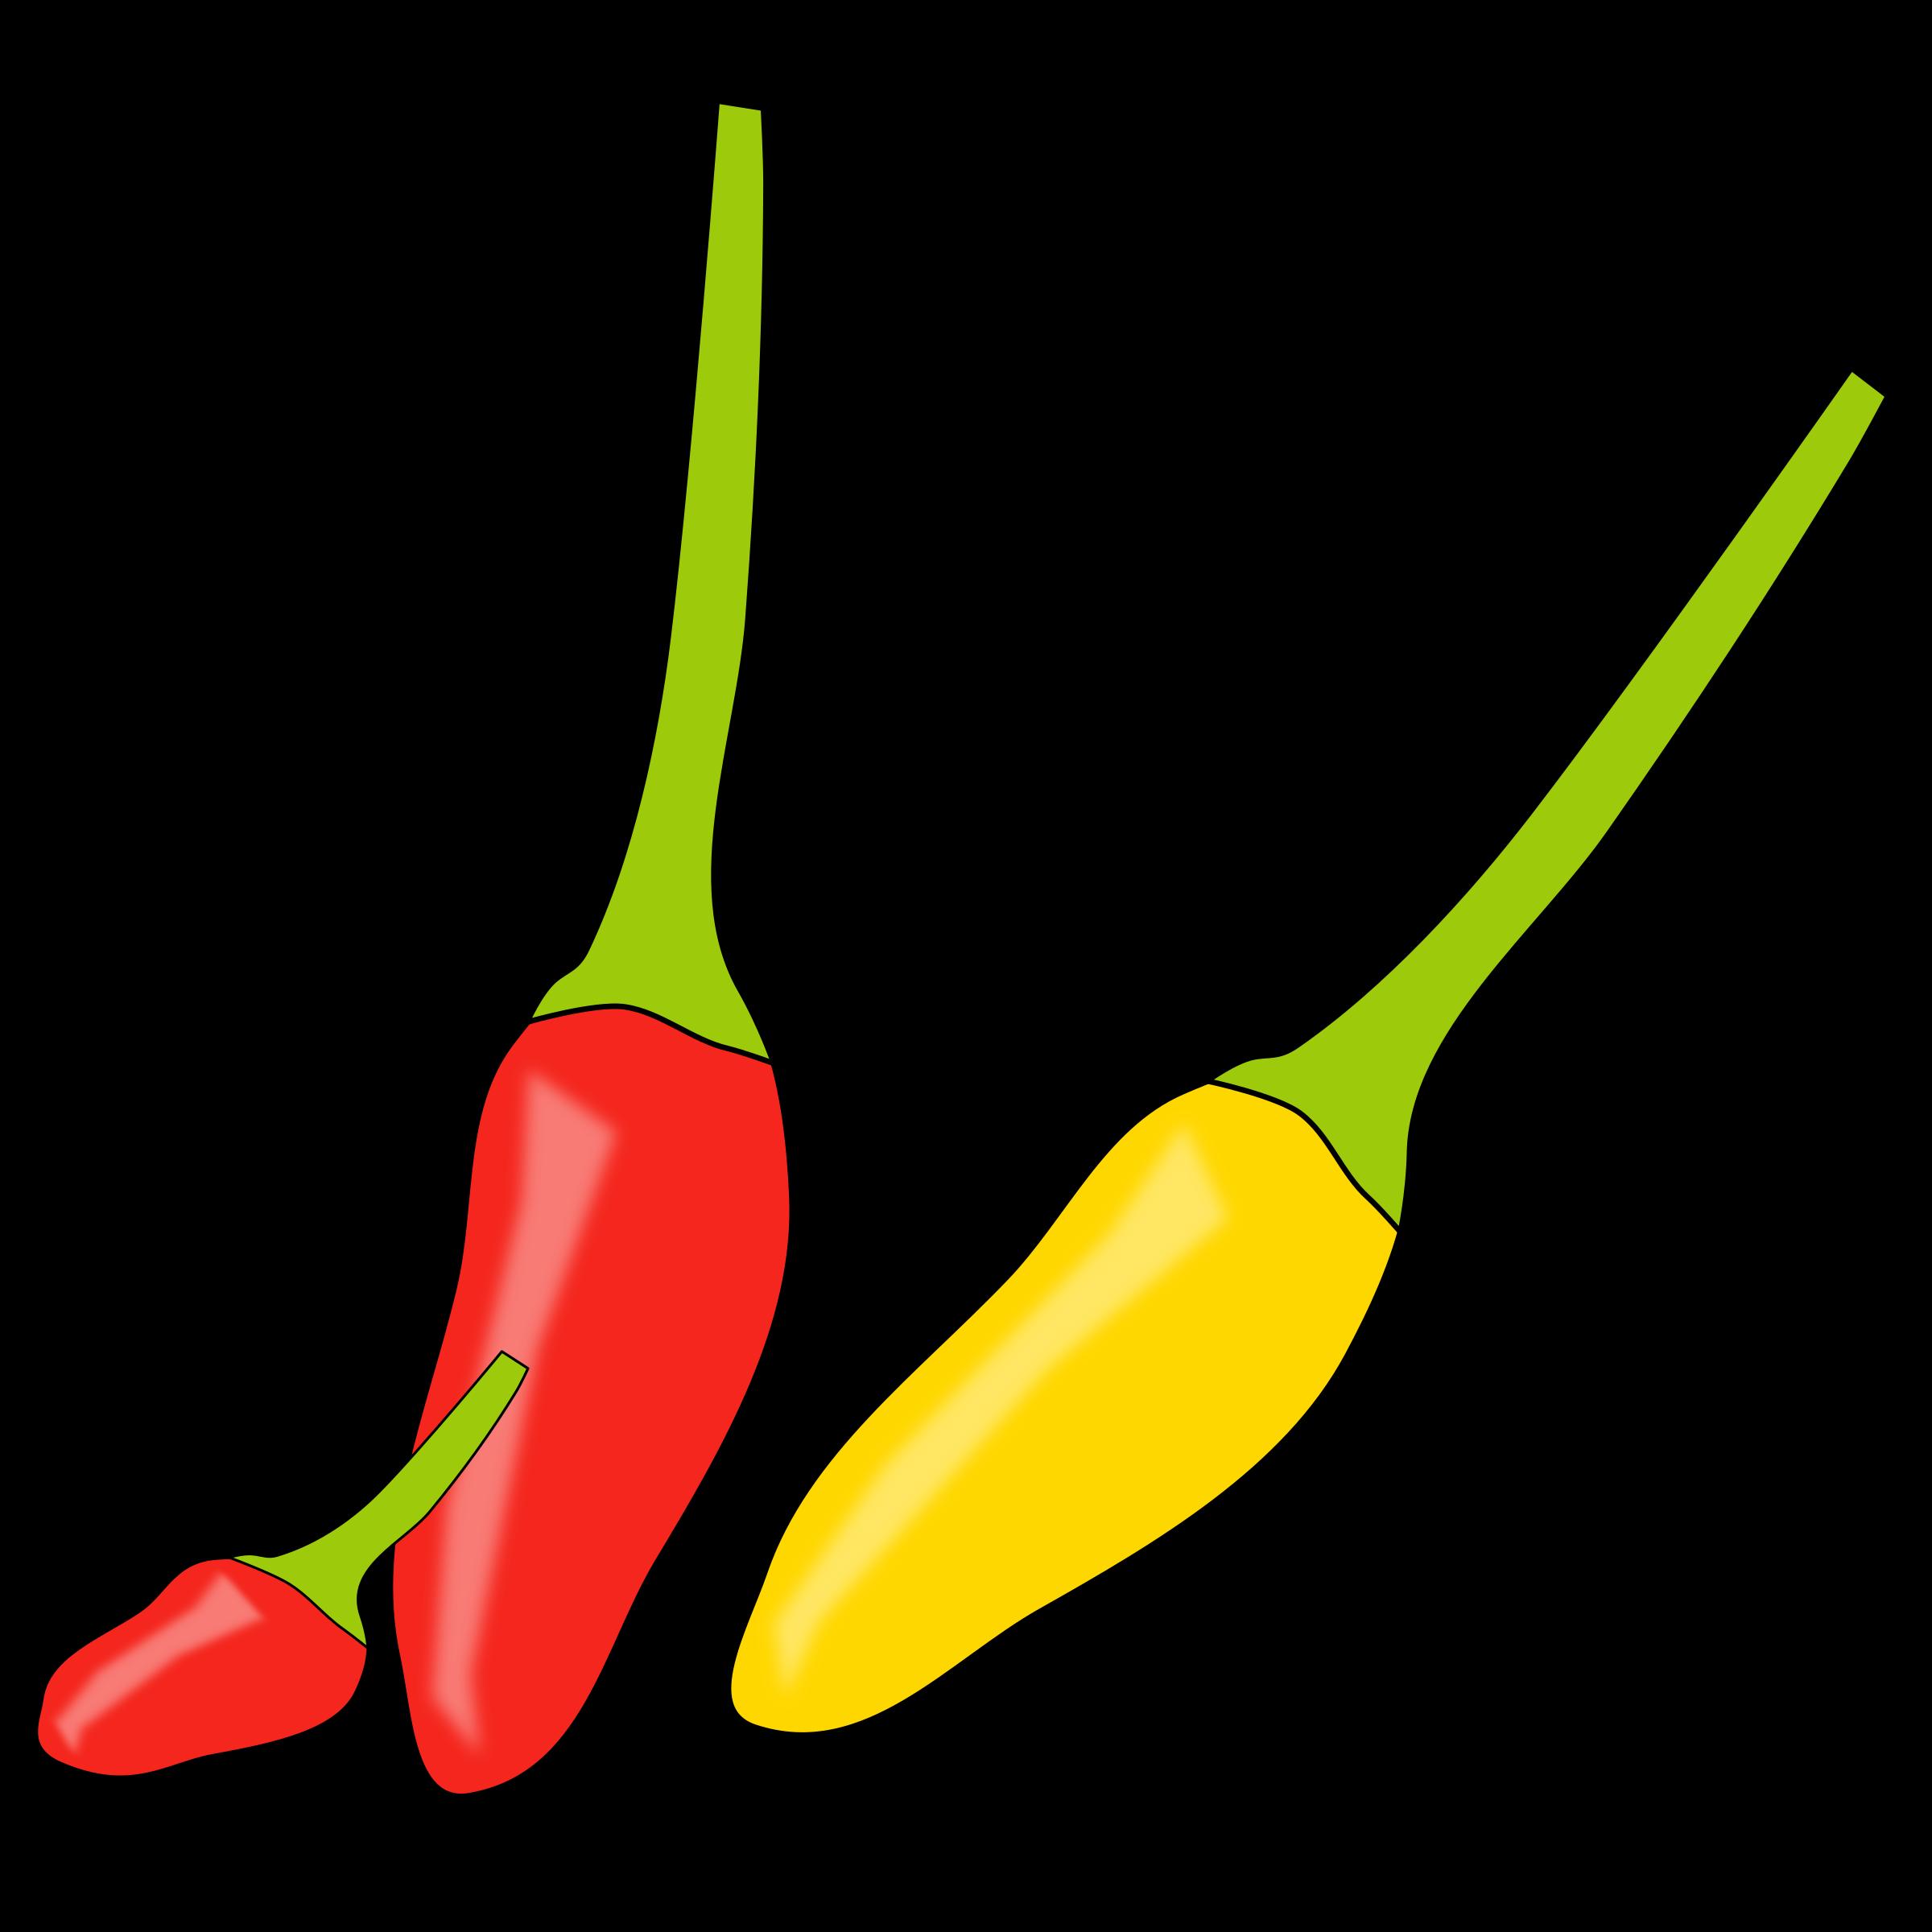 Chilli icons png free. Jalapeno clipart serrano pepper